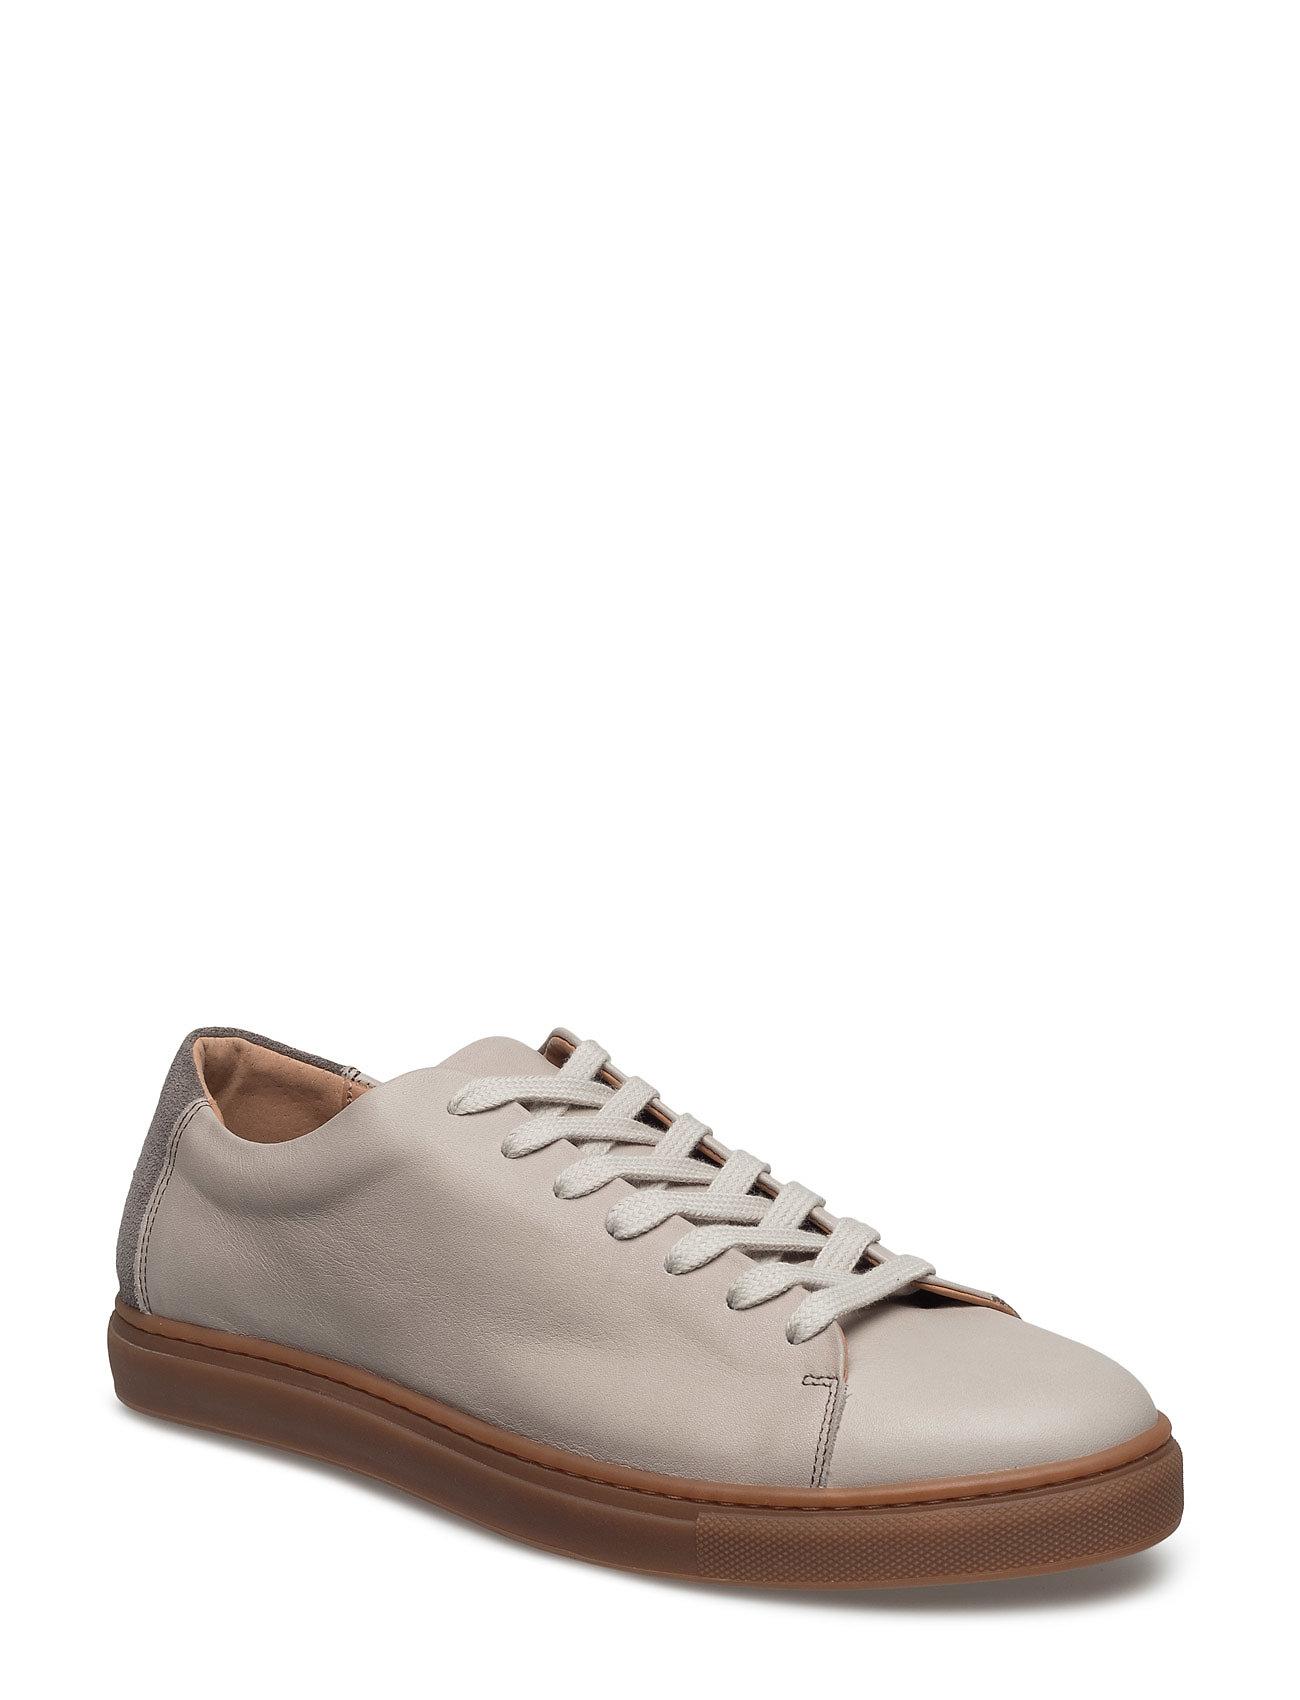 Shndavid New Leather Sneaker Selected Homme Sneakers til Herrer i SAND